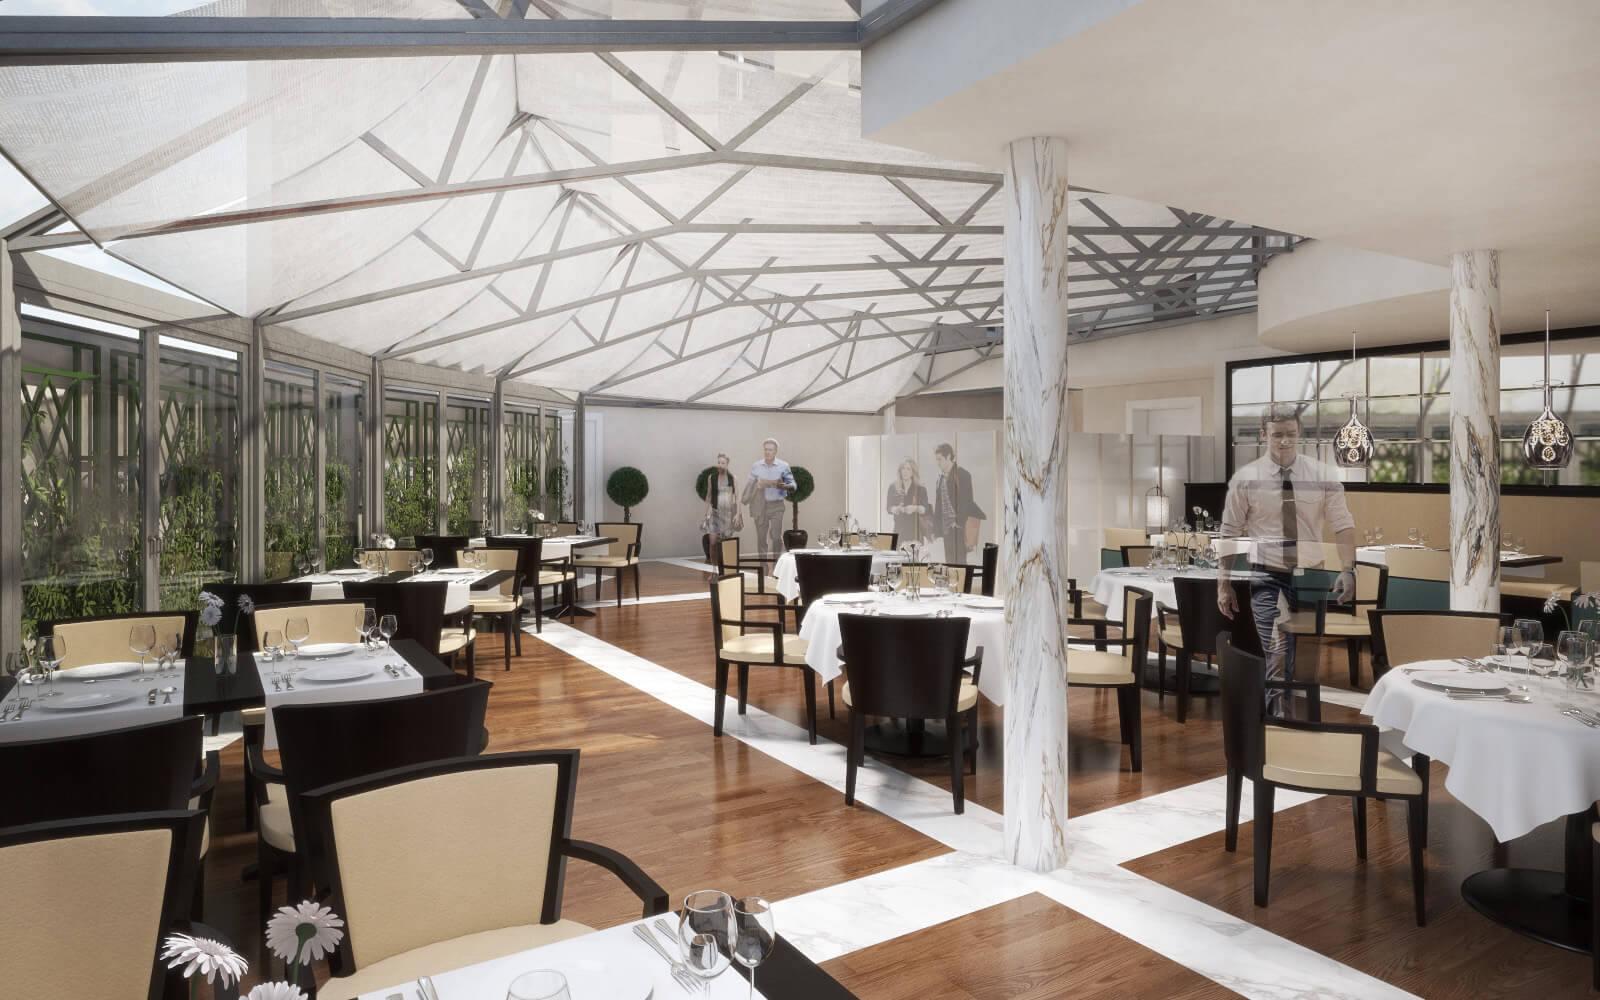 restoran skica2 croatia week